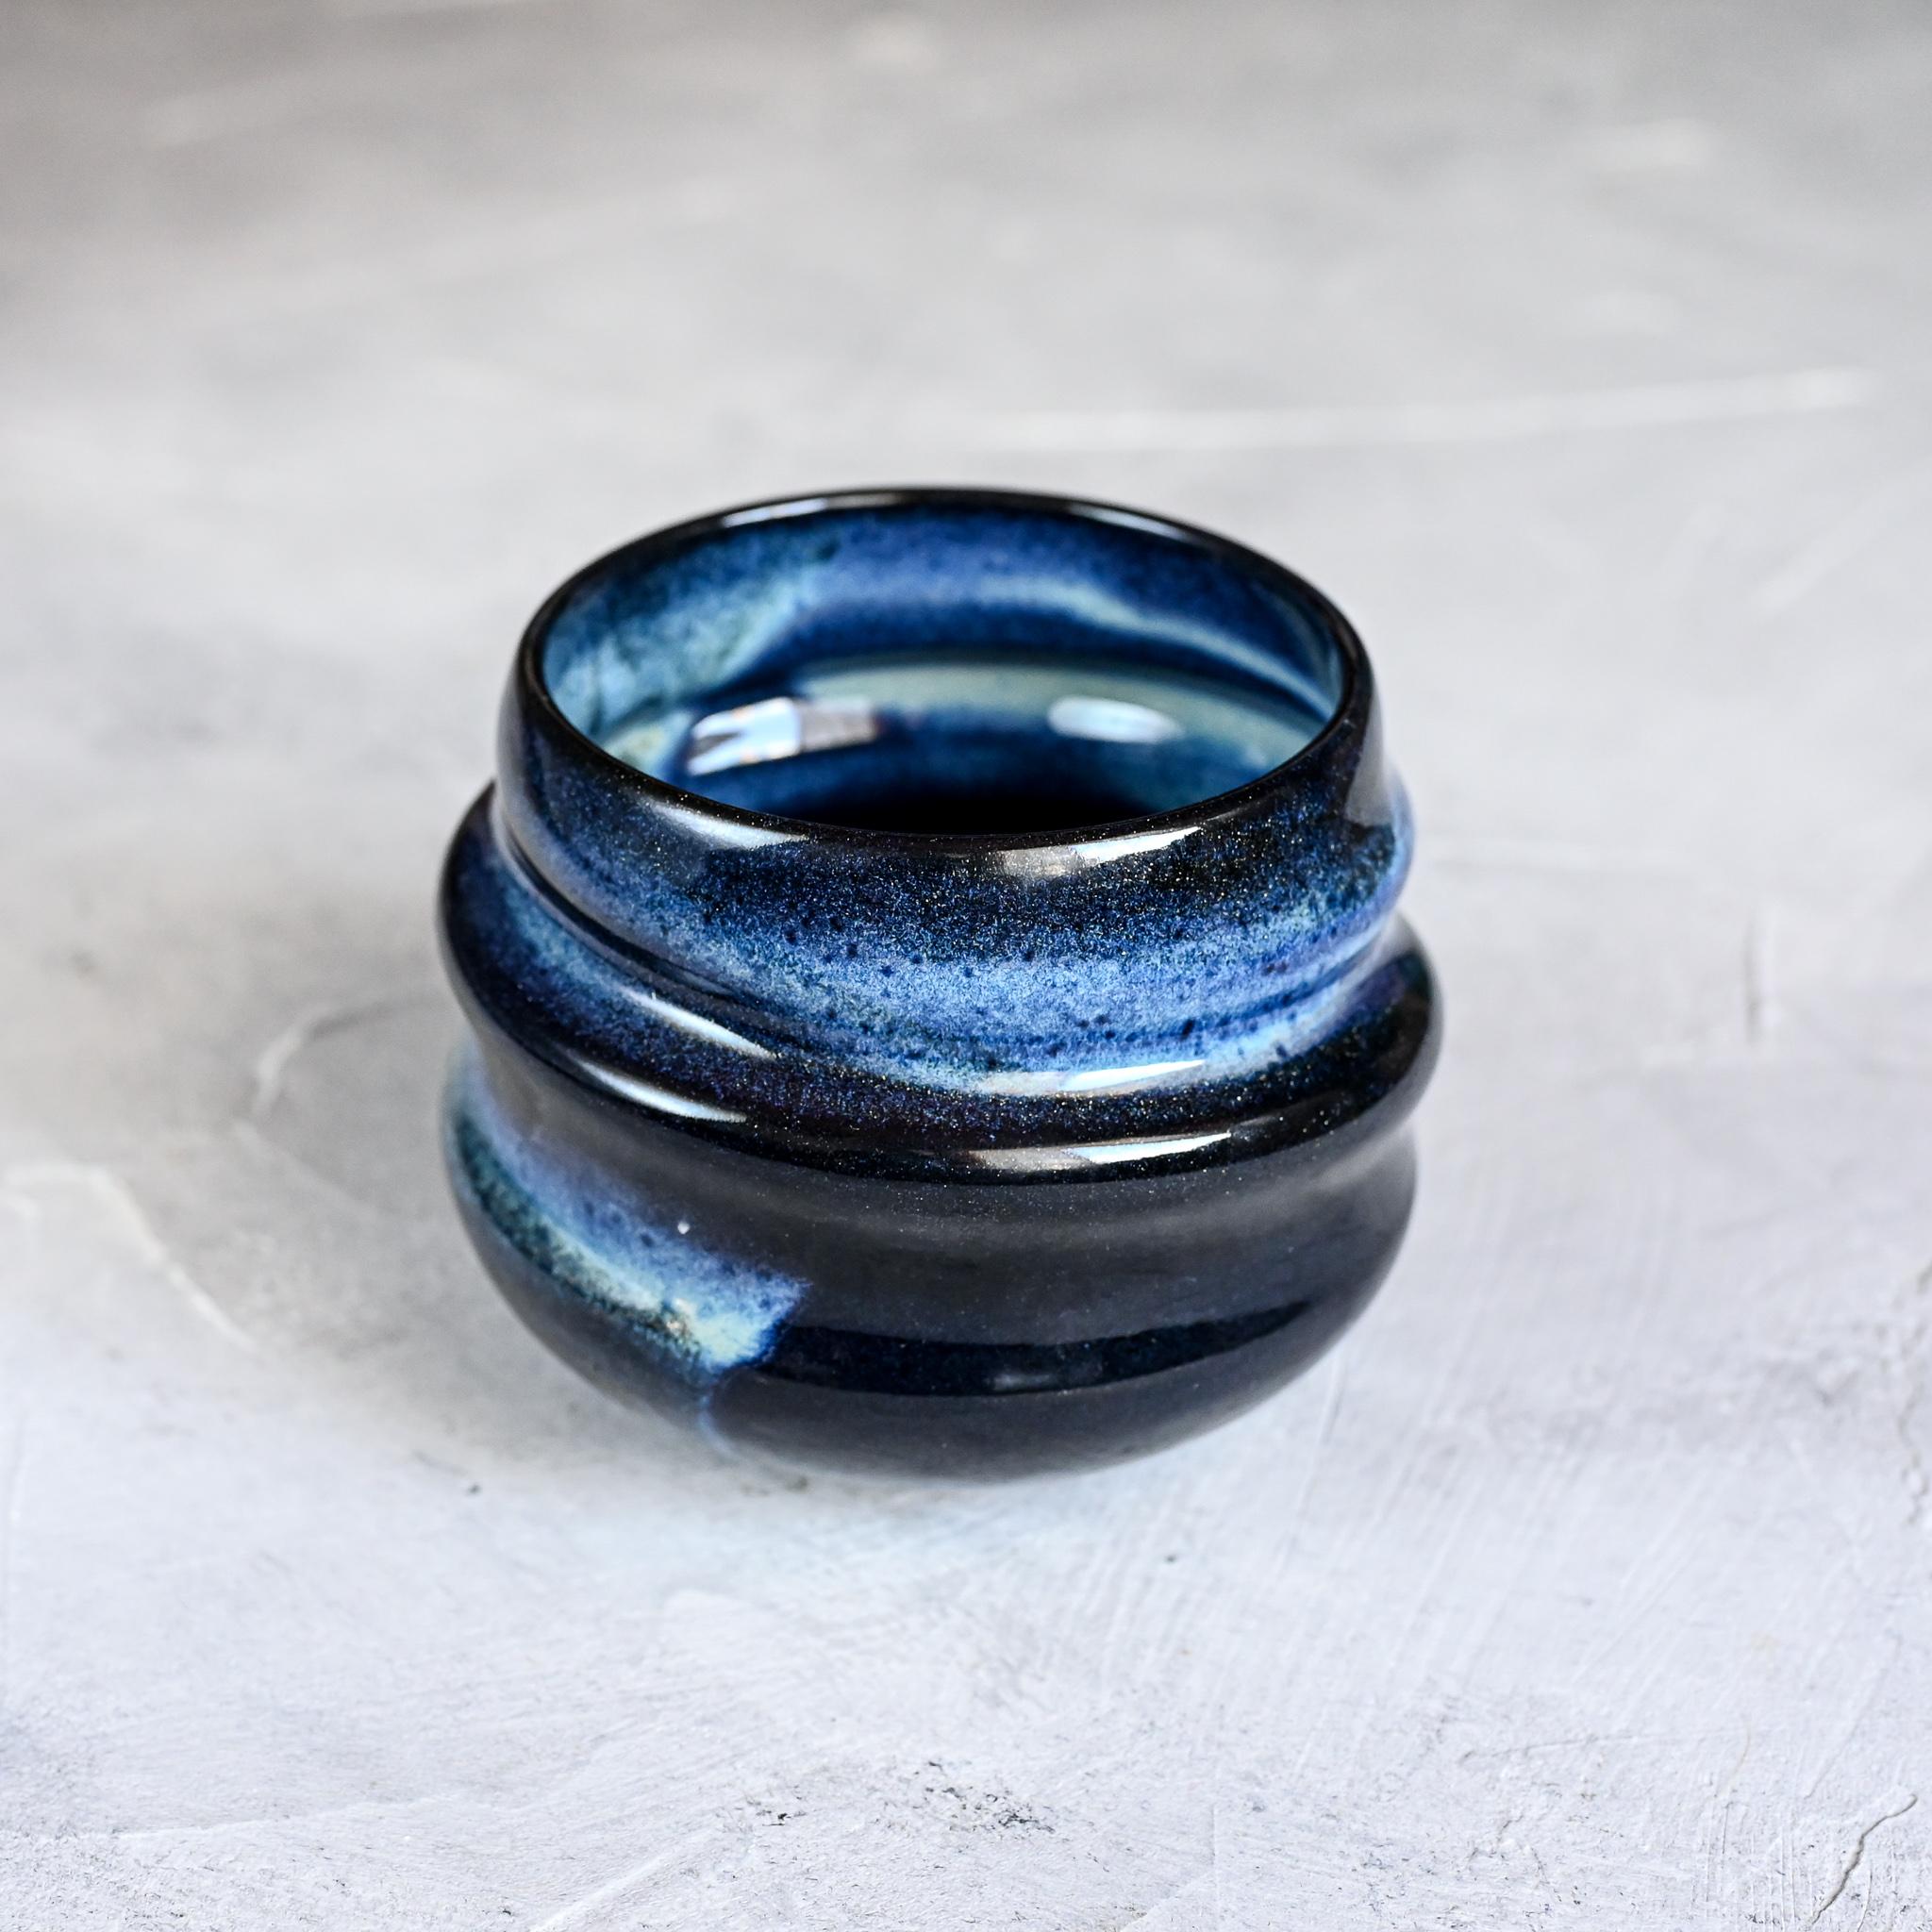 картинка Керамический стакан юноми Марии Левиной 21 - DishWishes.Ru